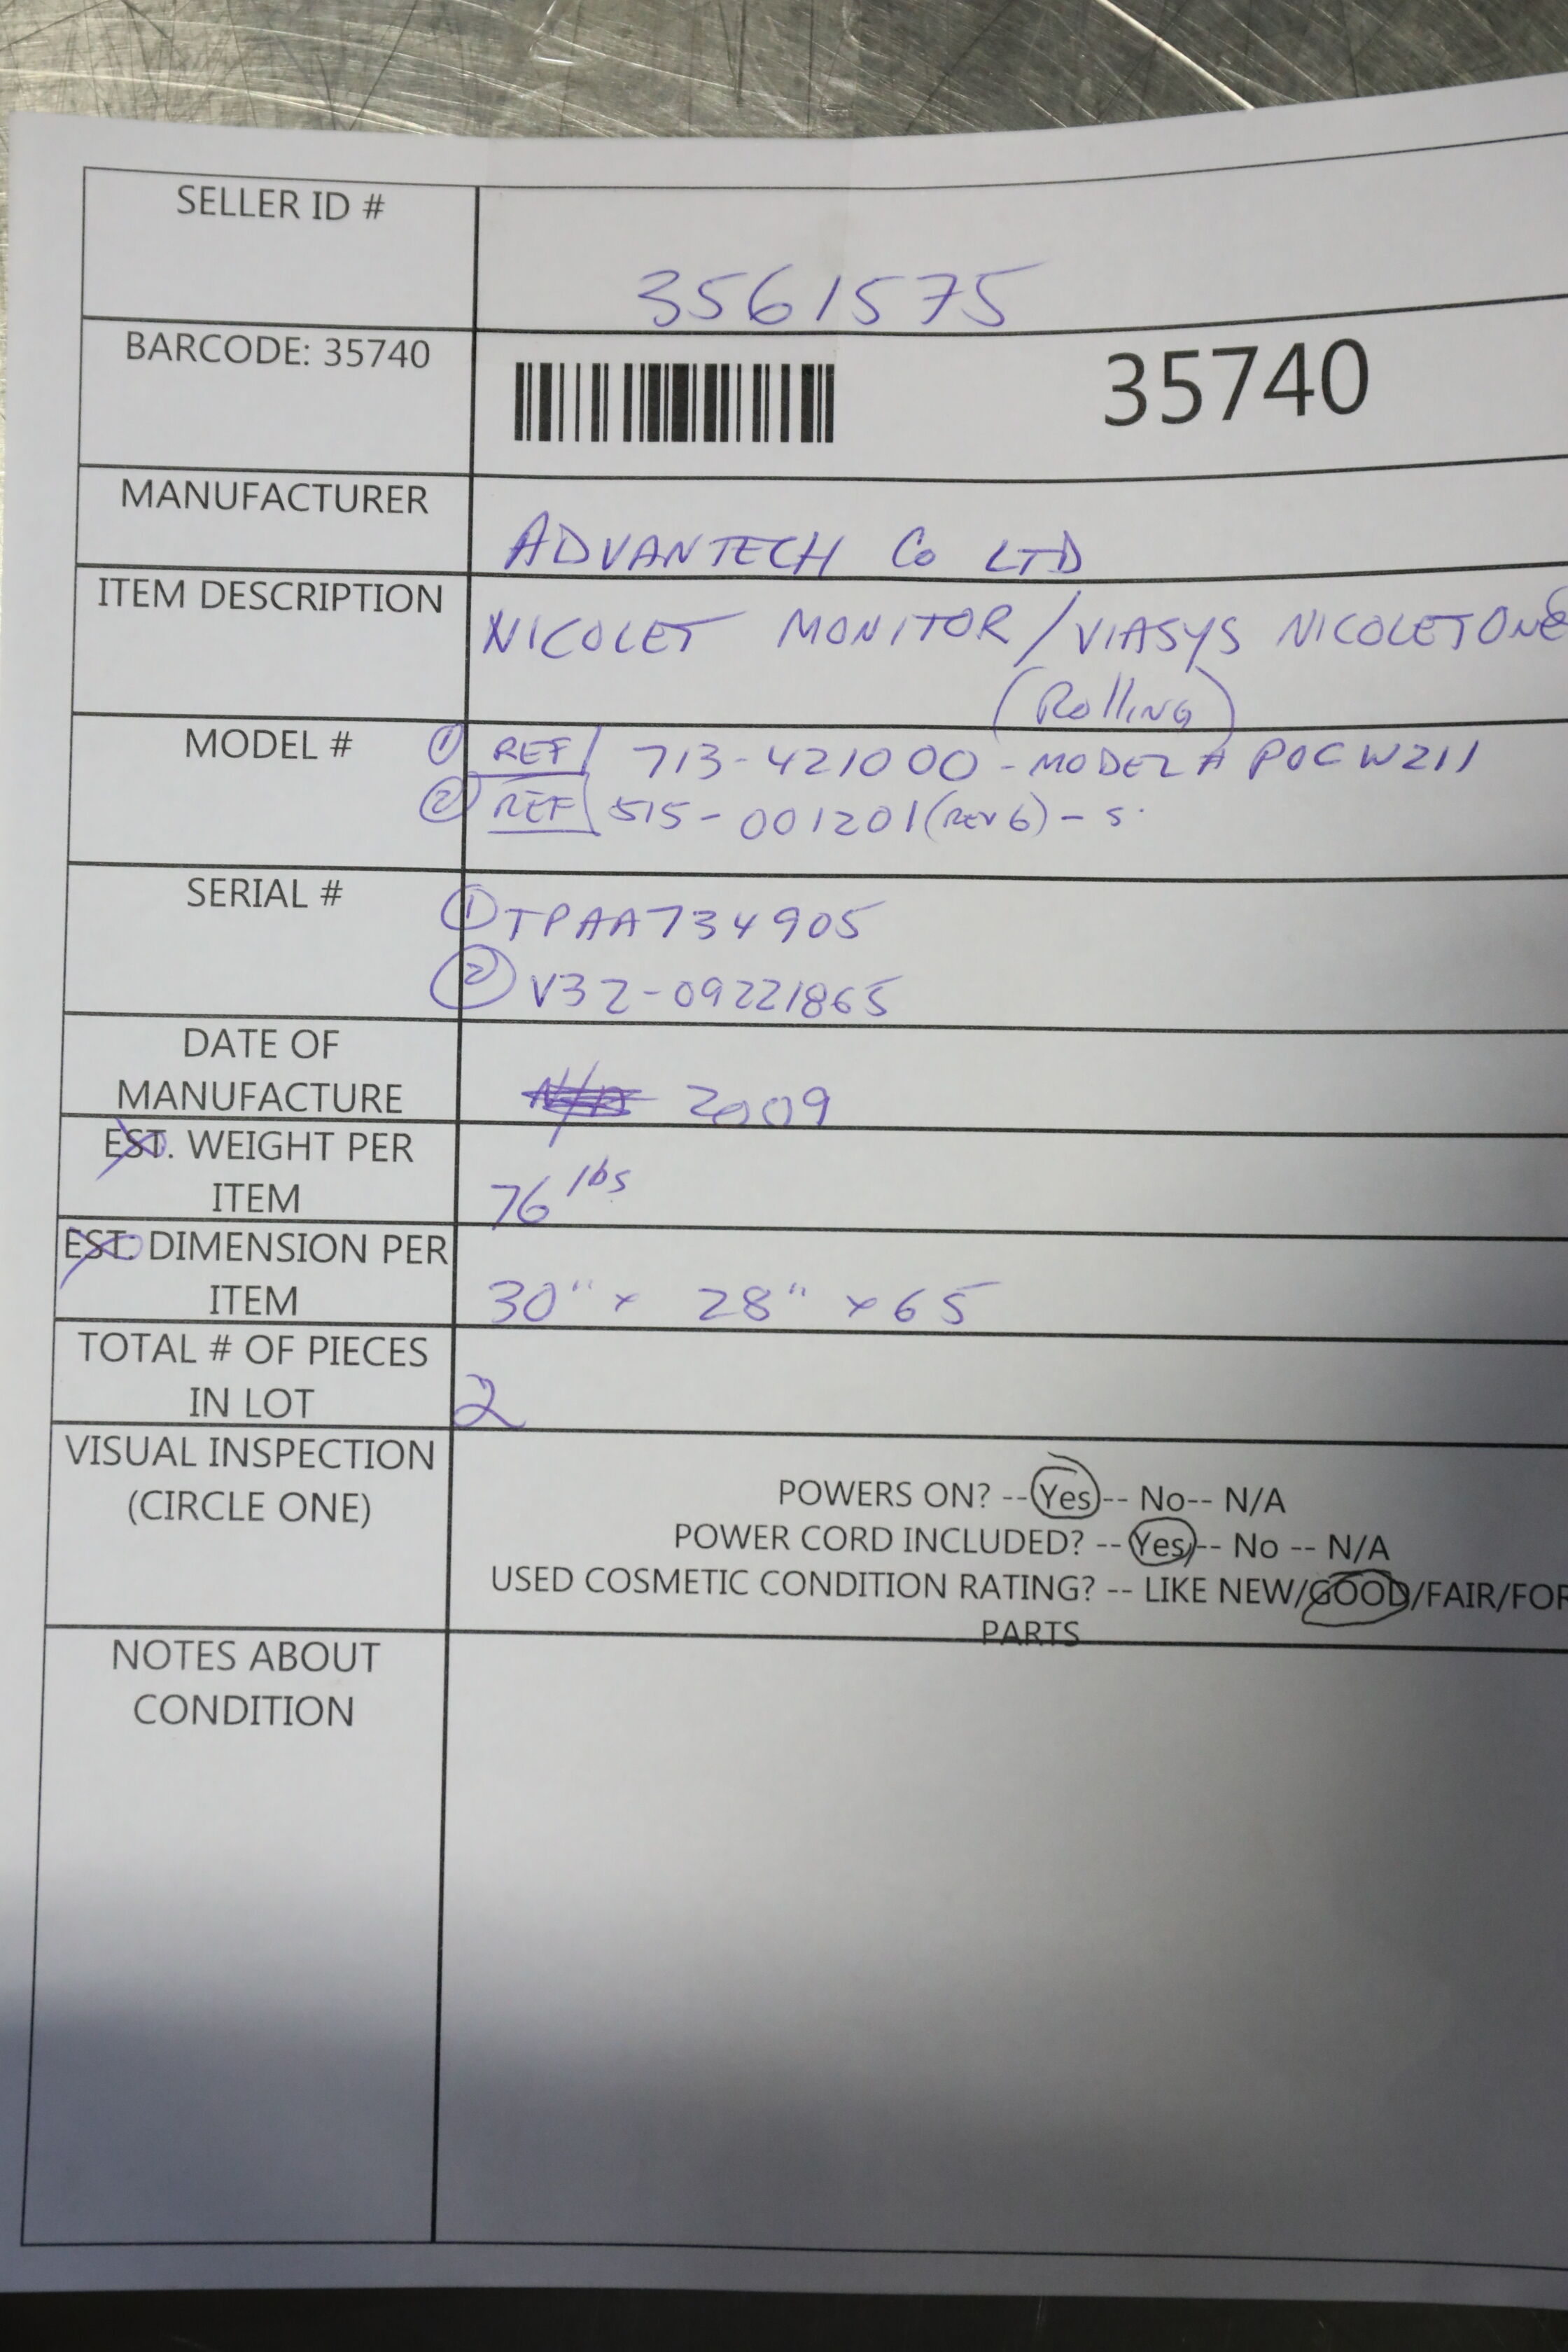 ADVANTECH CO / NICOLET POCW211 EEG Unit